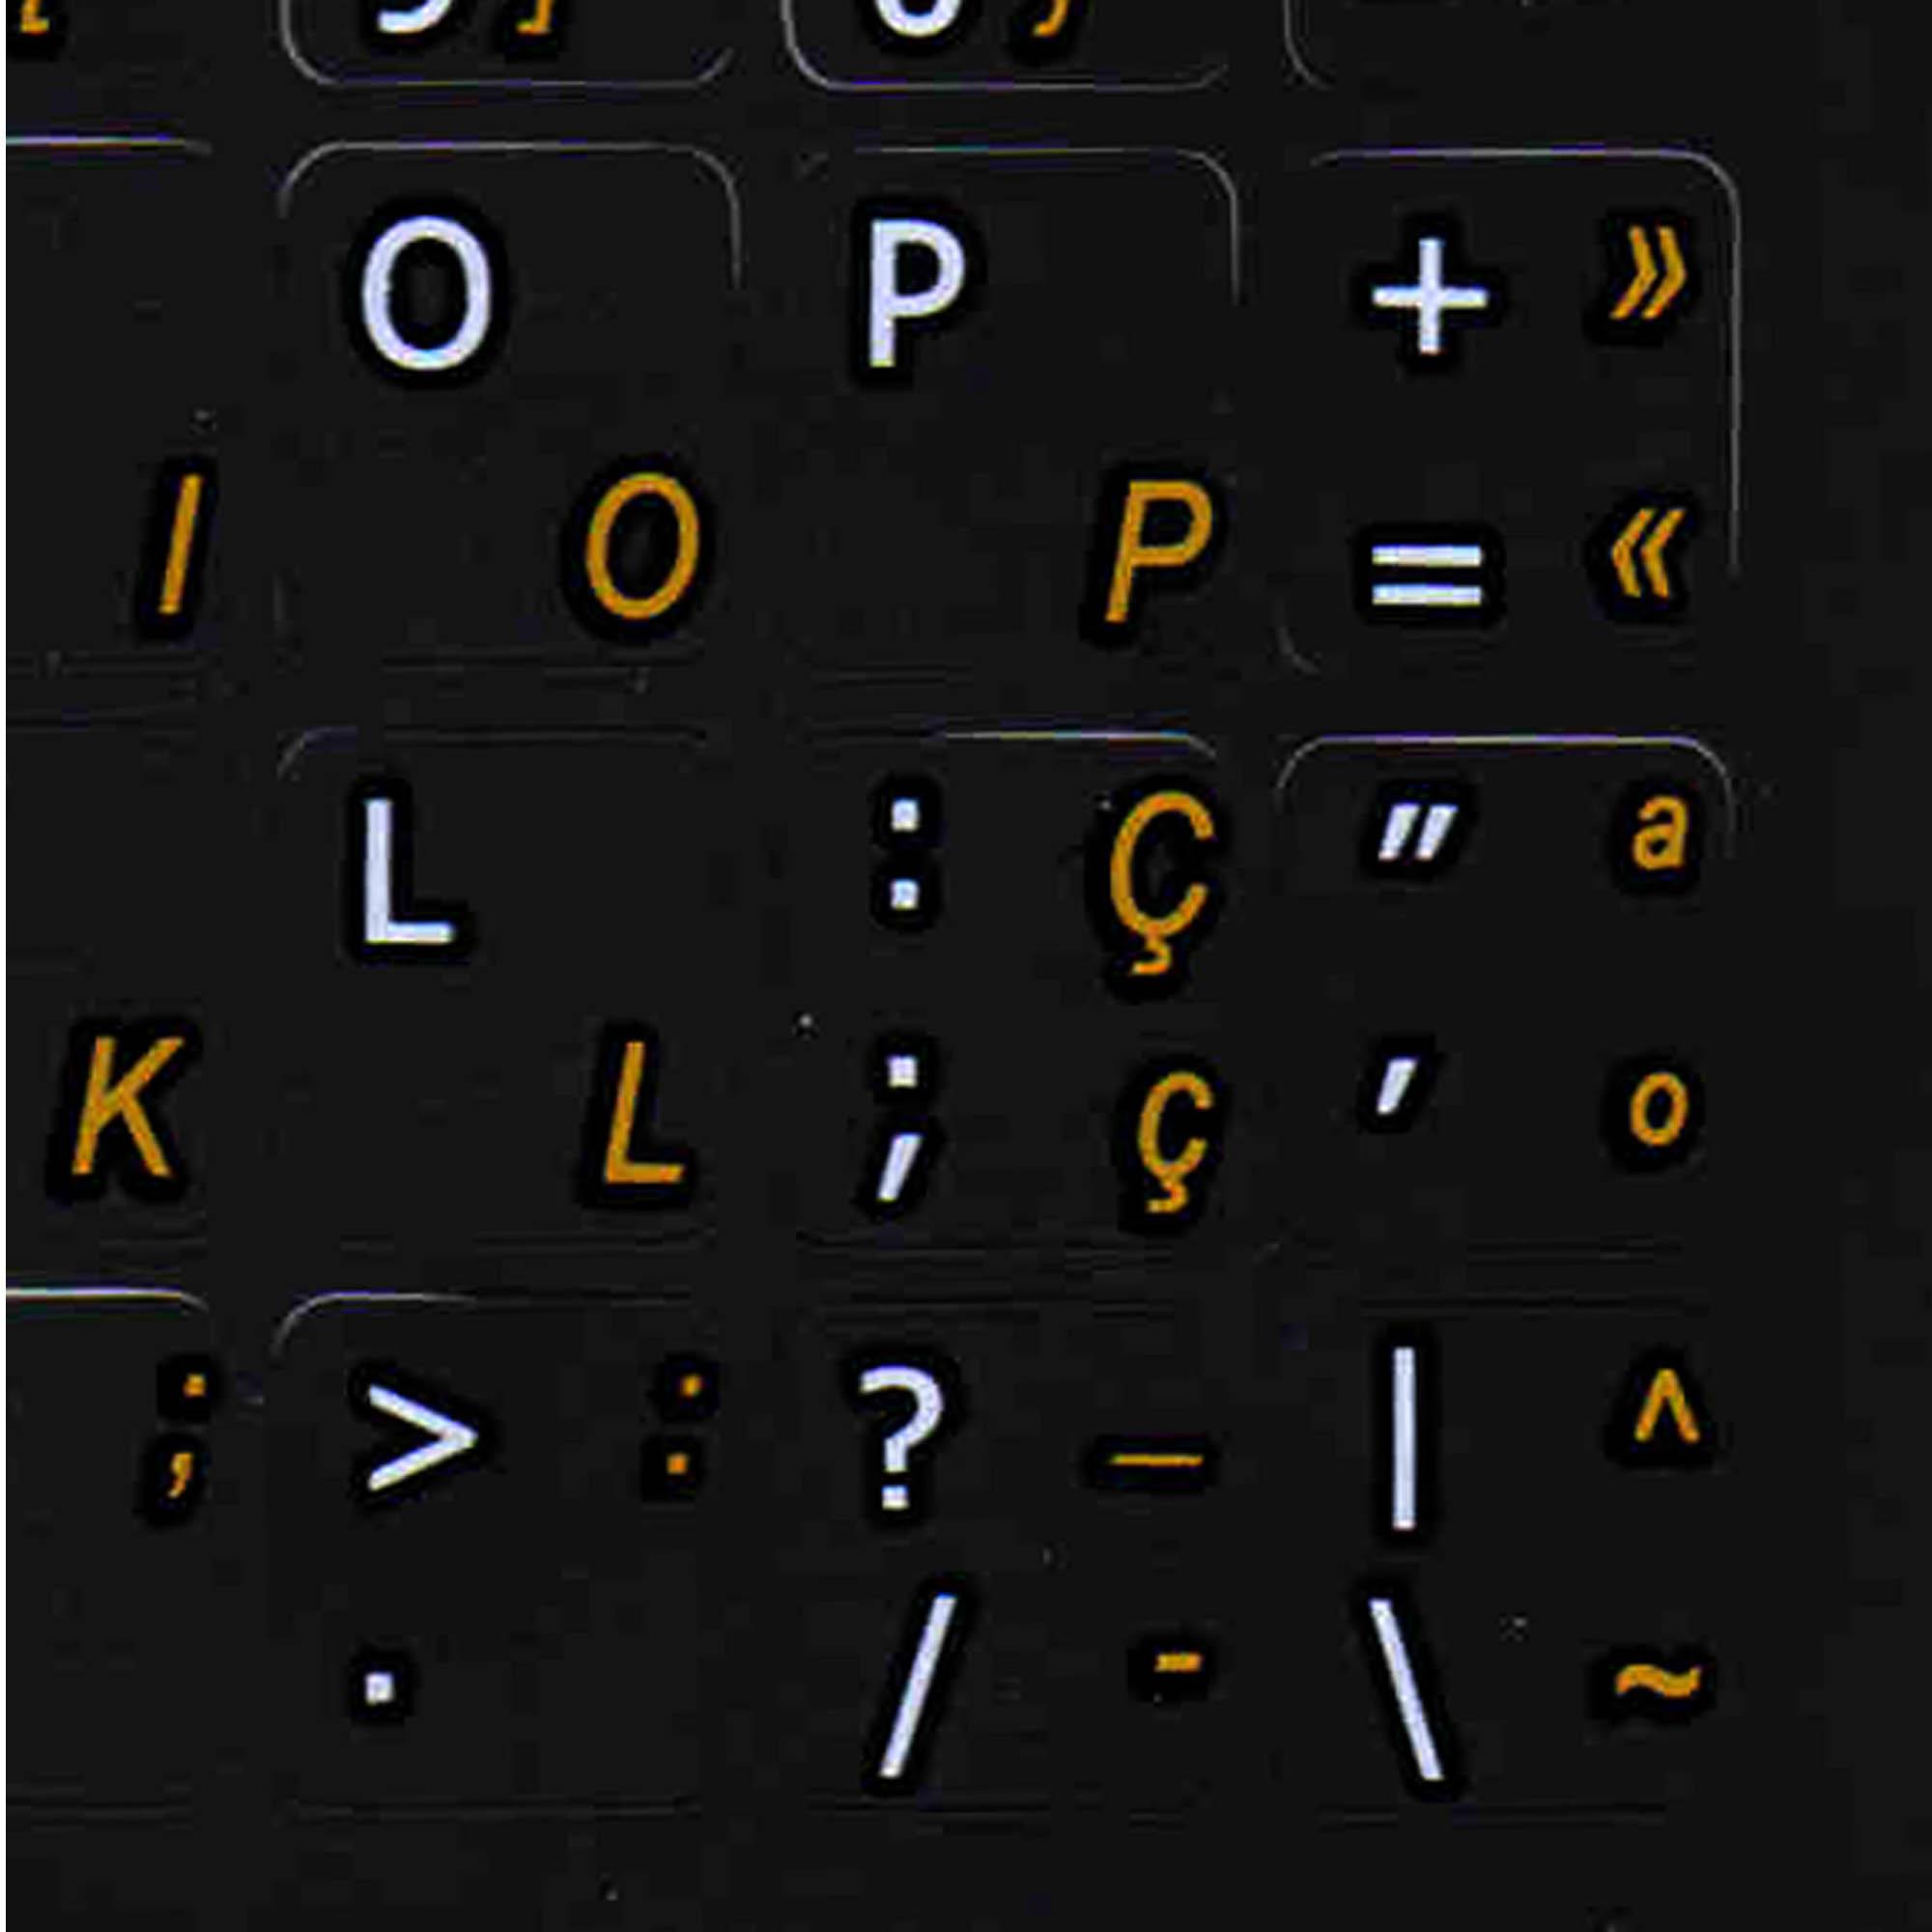 Portuguese English keyboard stickers non transparent black